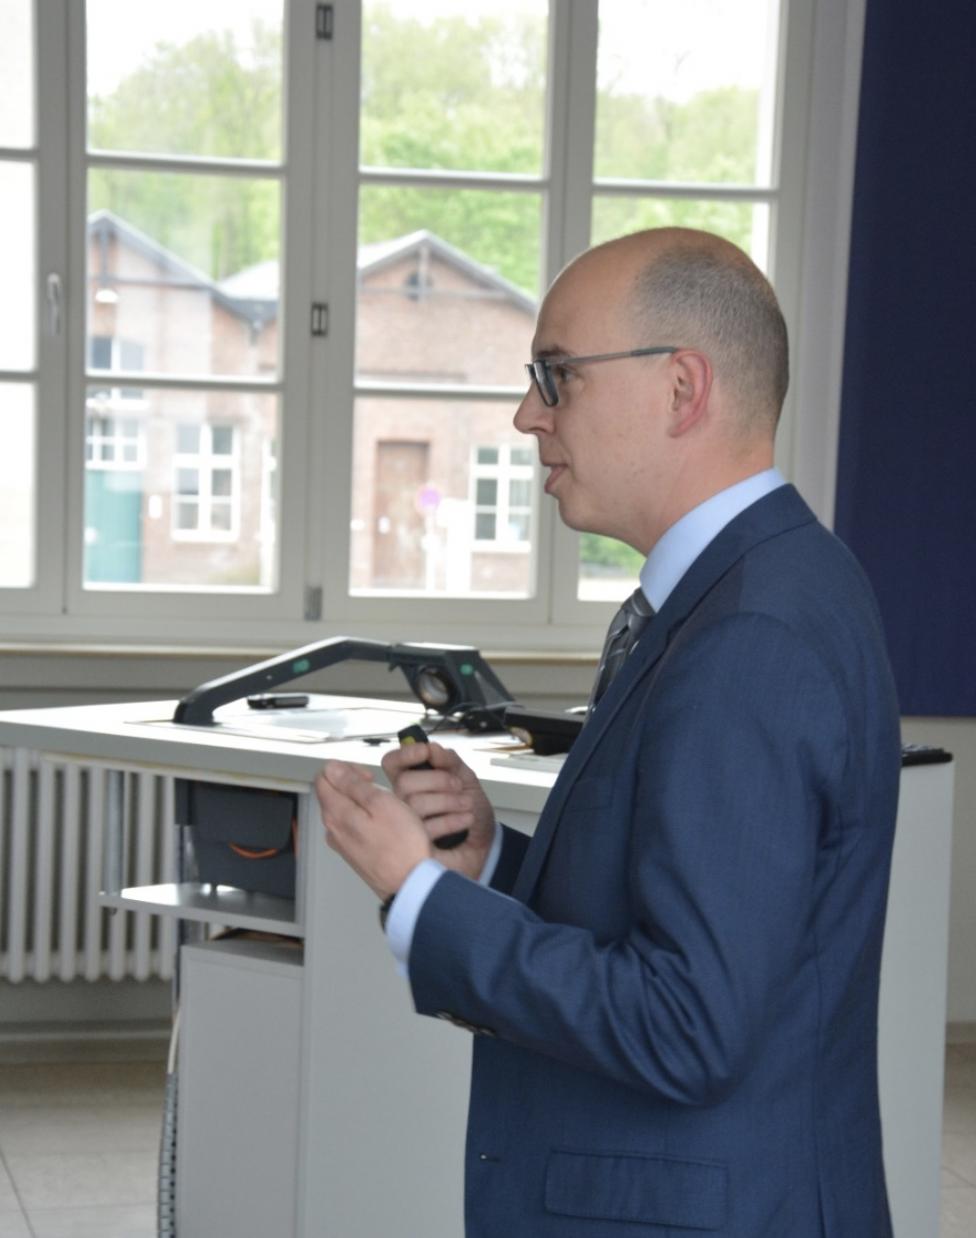 Lienz FH Aachen Akademie ZVA Bachelor Optometrie Augenoptik